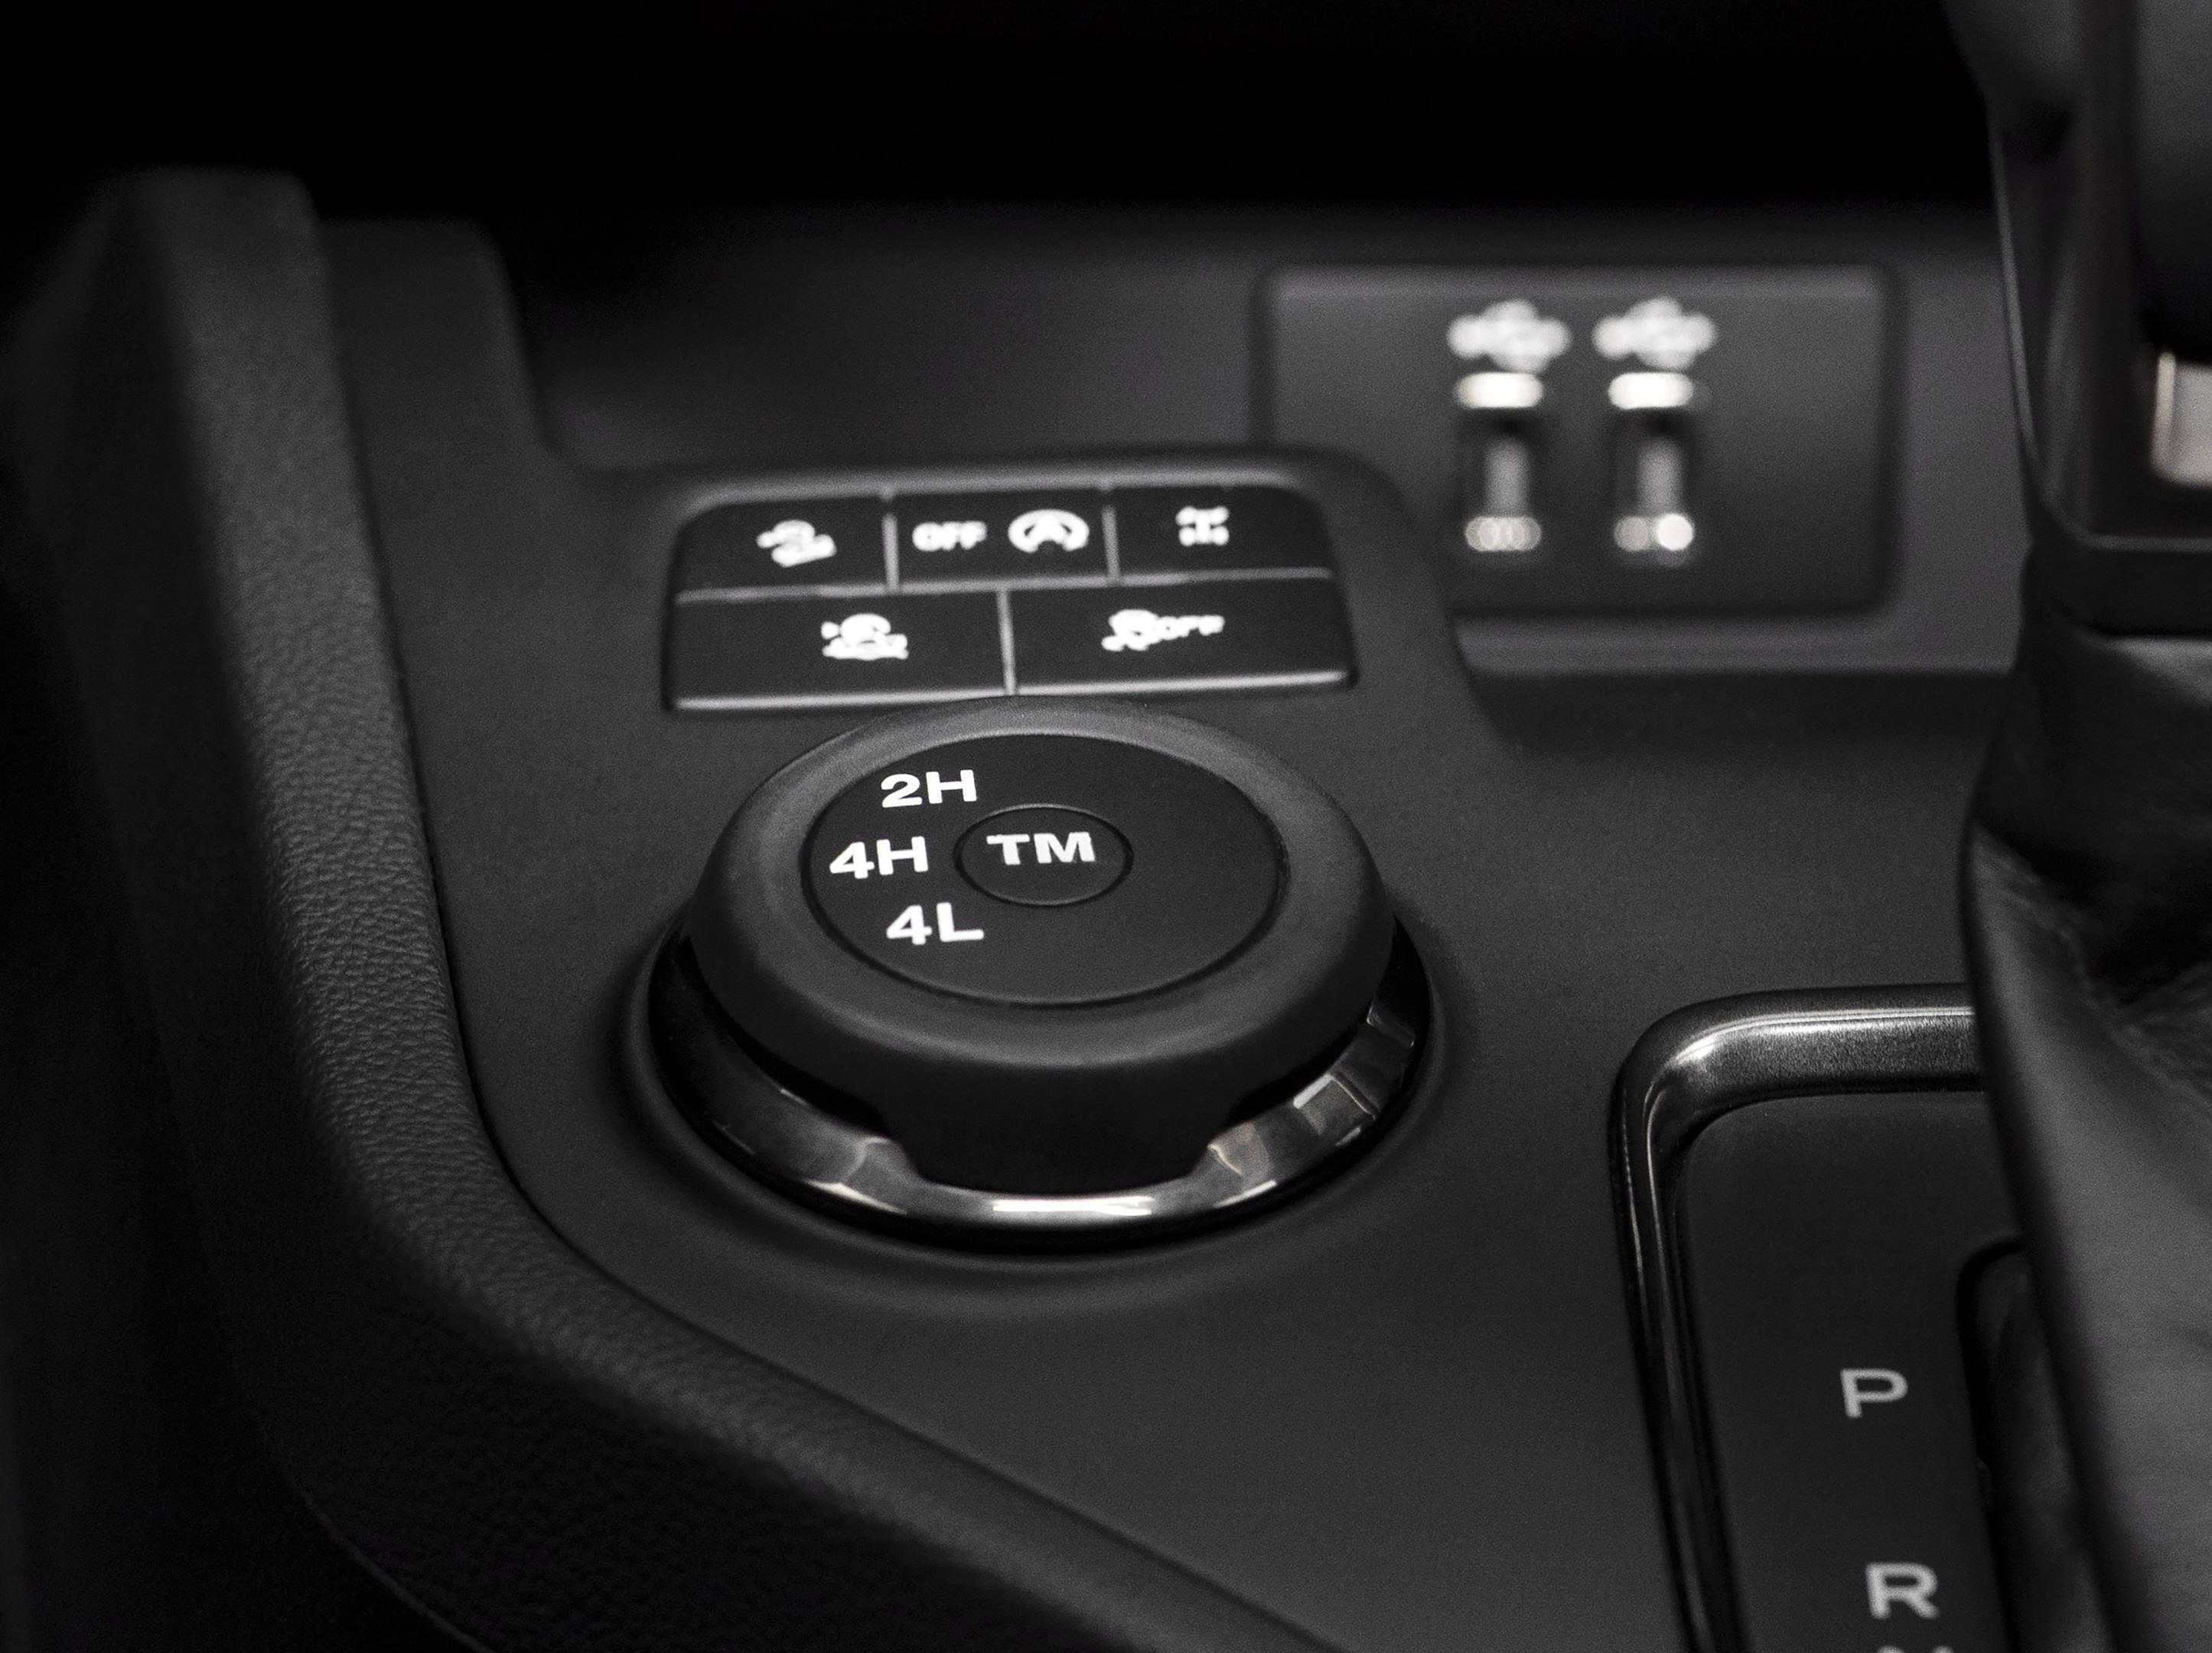 2019 Ford Ranger 4x4 nob